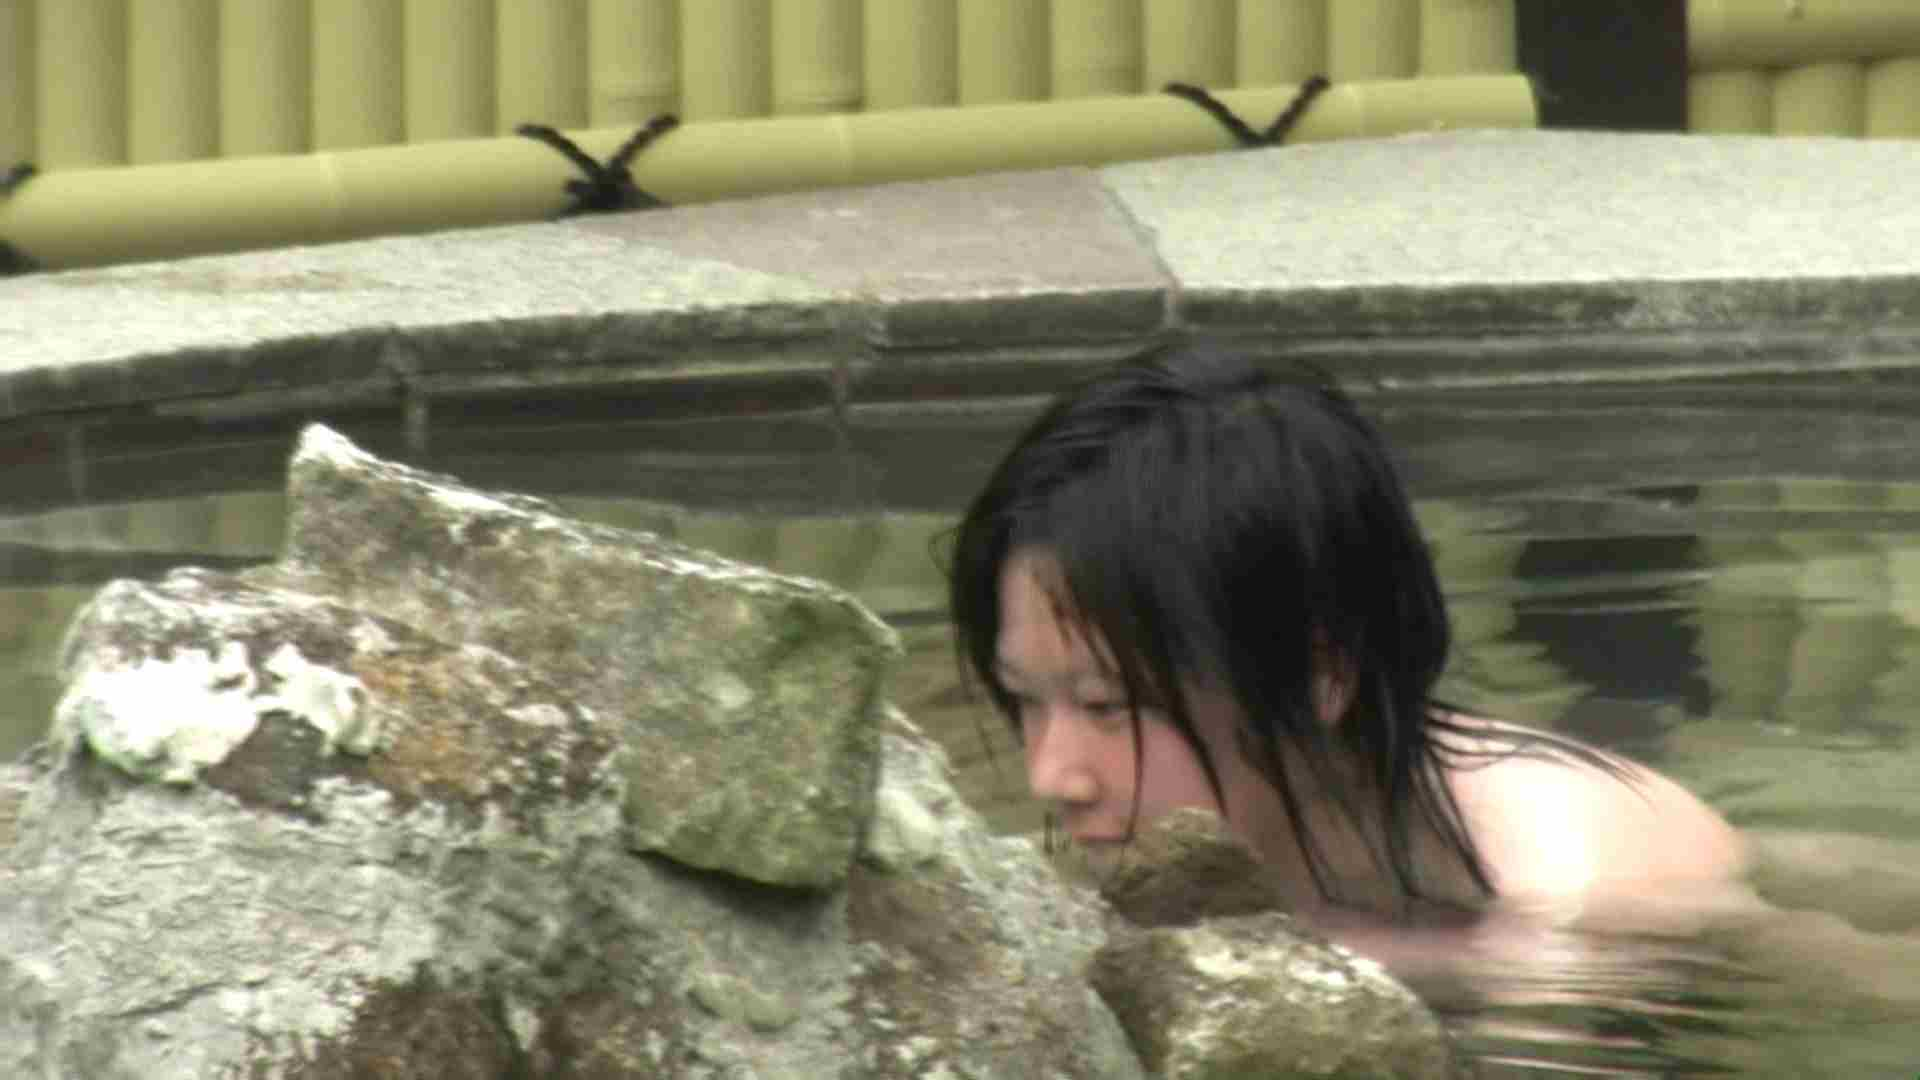 Aquaな露天風呂Vol.36 盗撮シリーズ   露天風呂編  99PIX 99